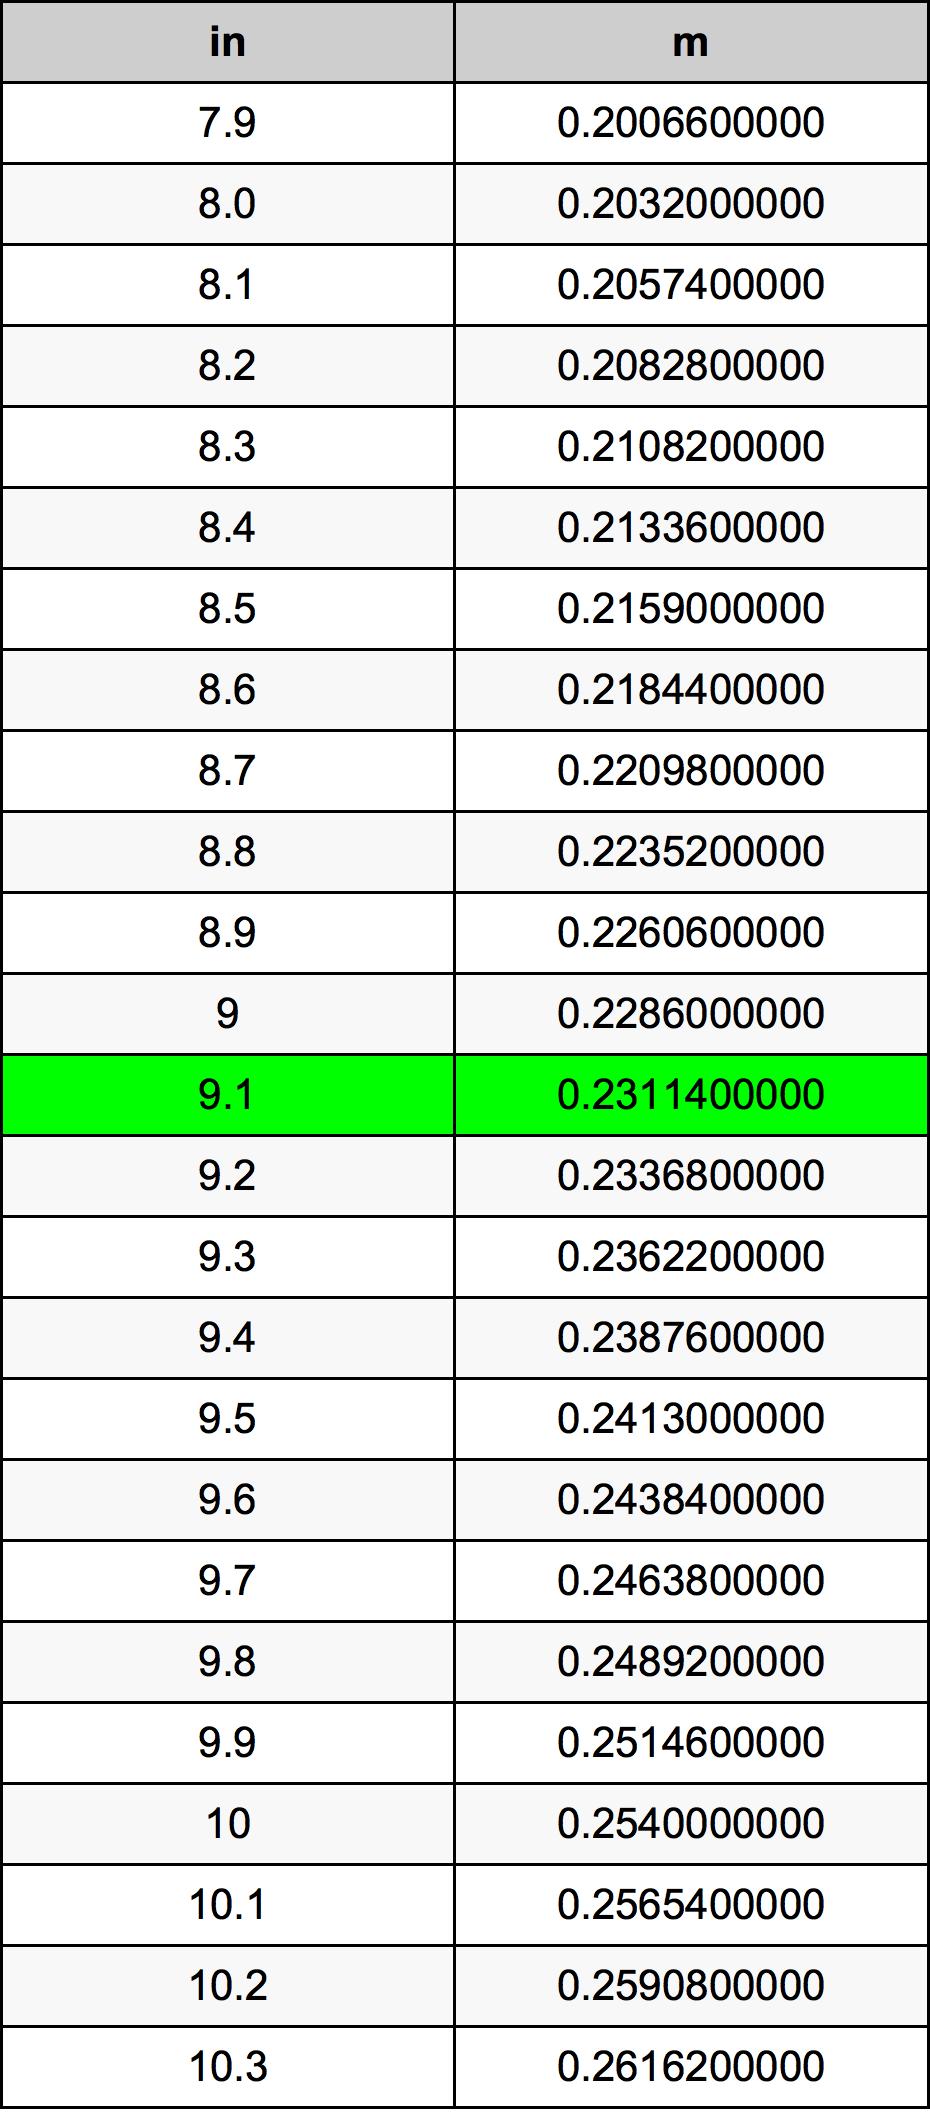 9.1 Inci konversi tabel